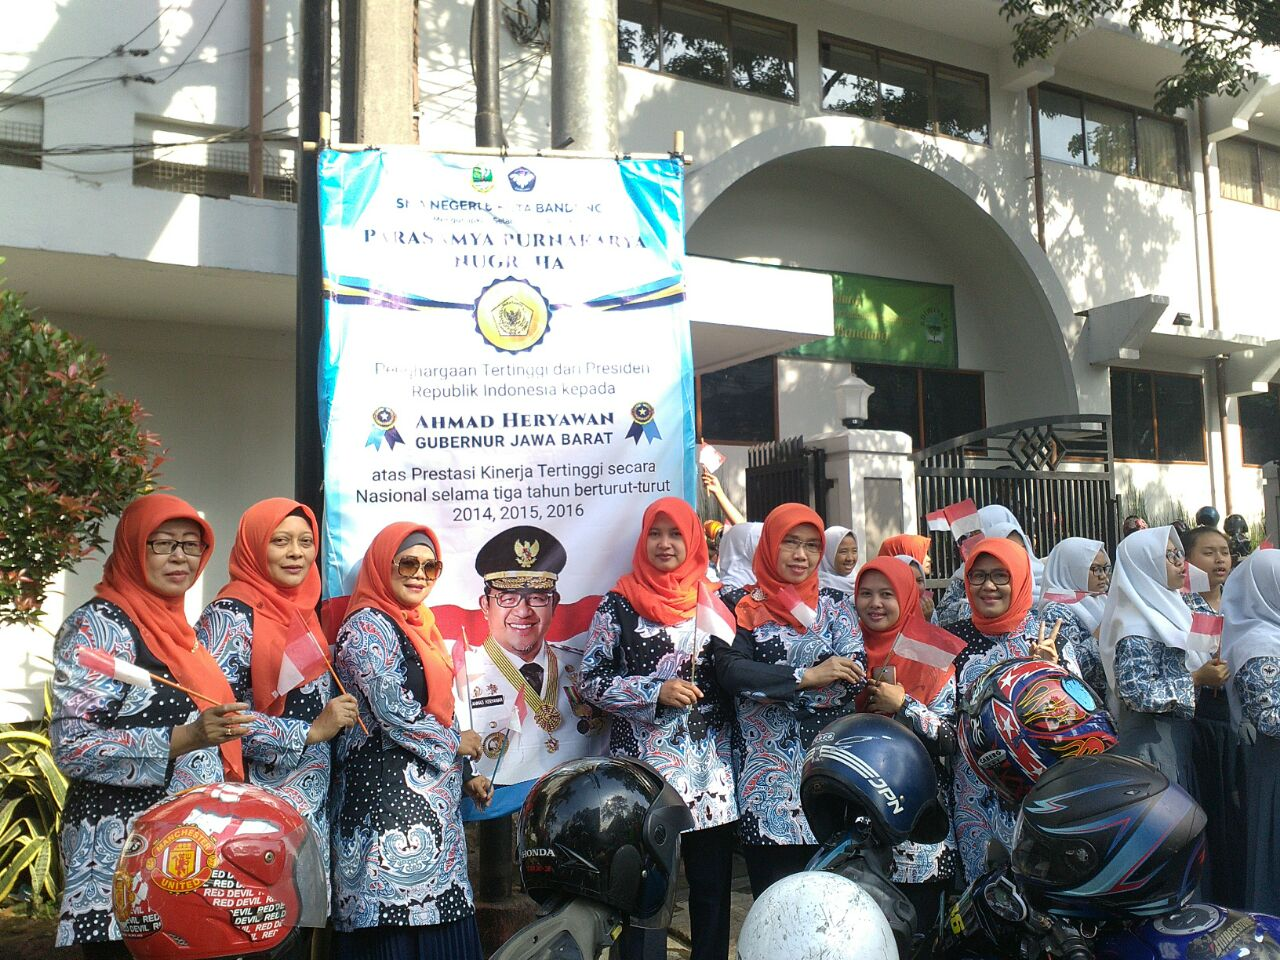 Penyambutan Penghargaan Tertinggi Presiden kepada Gubernur Jawa Ahmad Heriawan